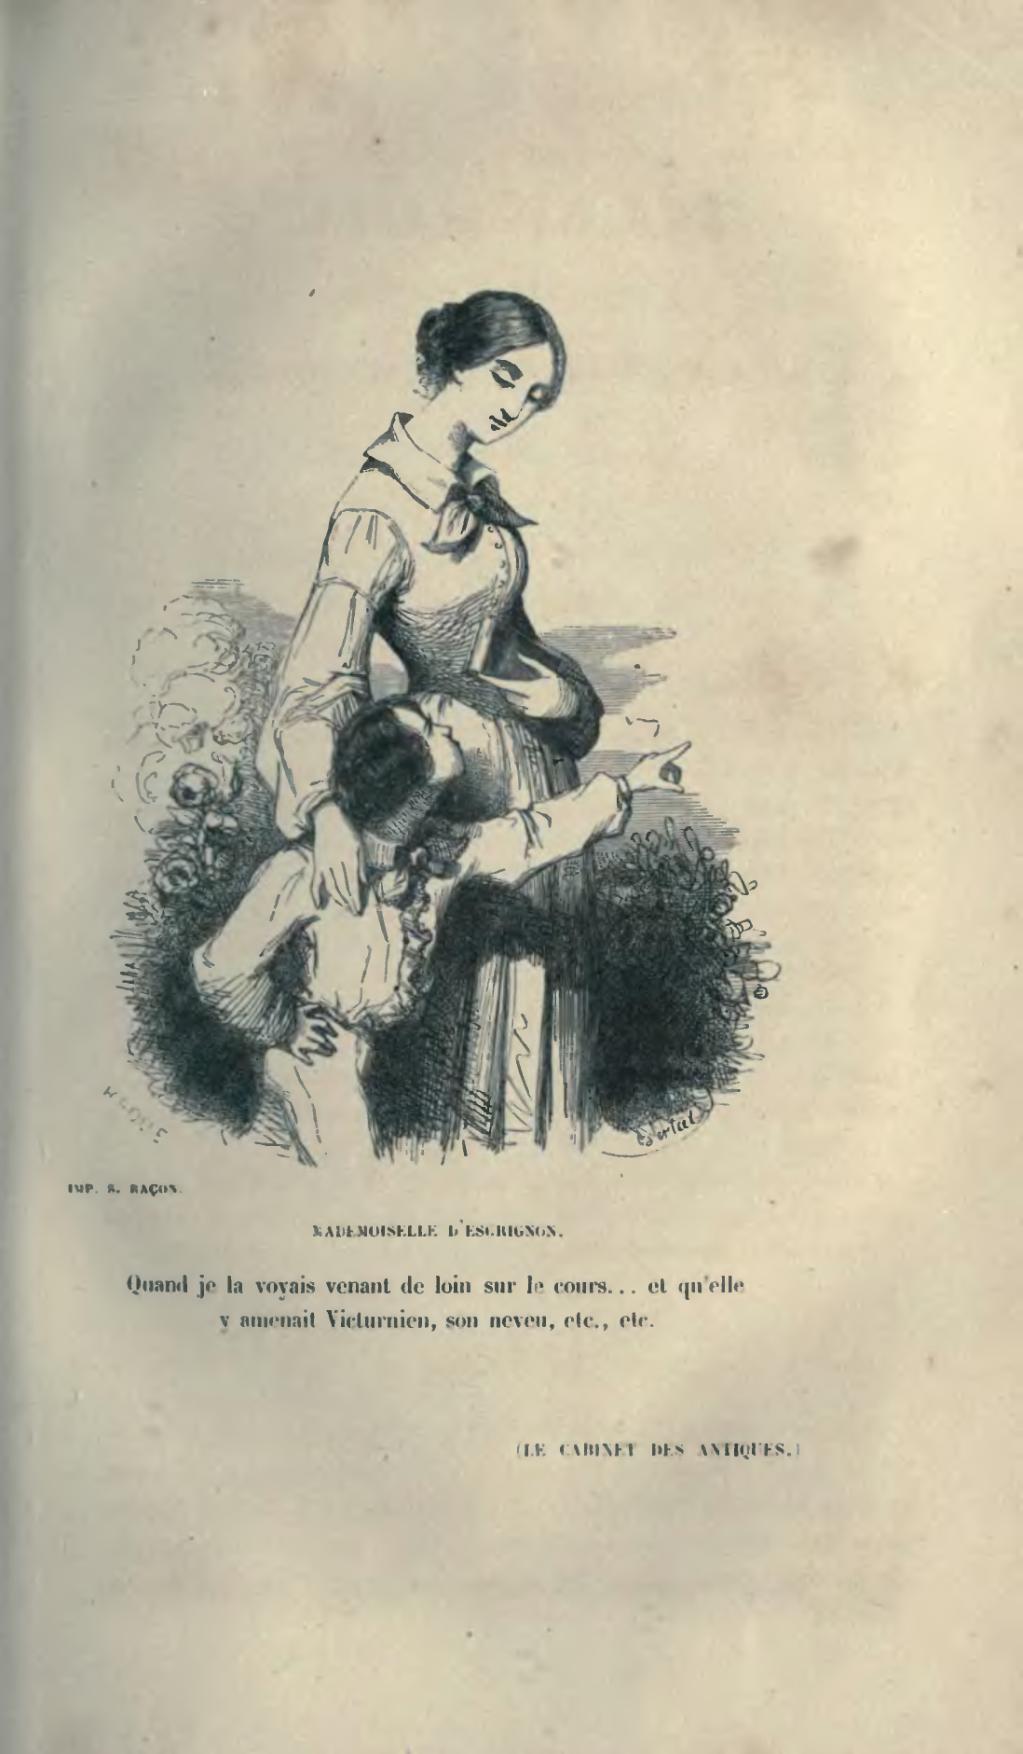 page balzac œuvres compl 232 tes 233 d houssiaux 1874 tome 7 djvu 137 wikisource